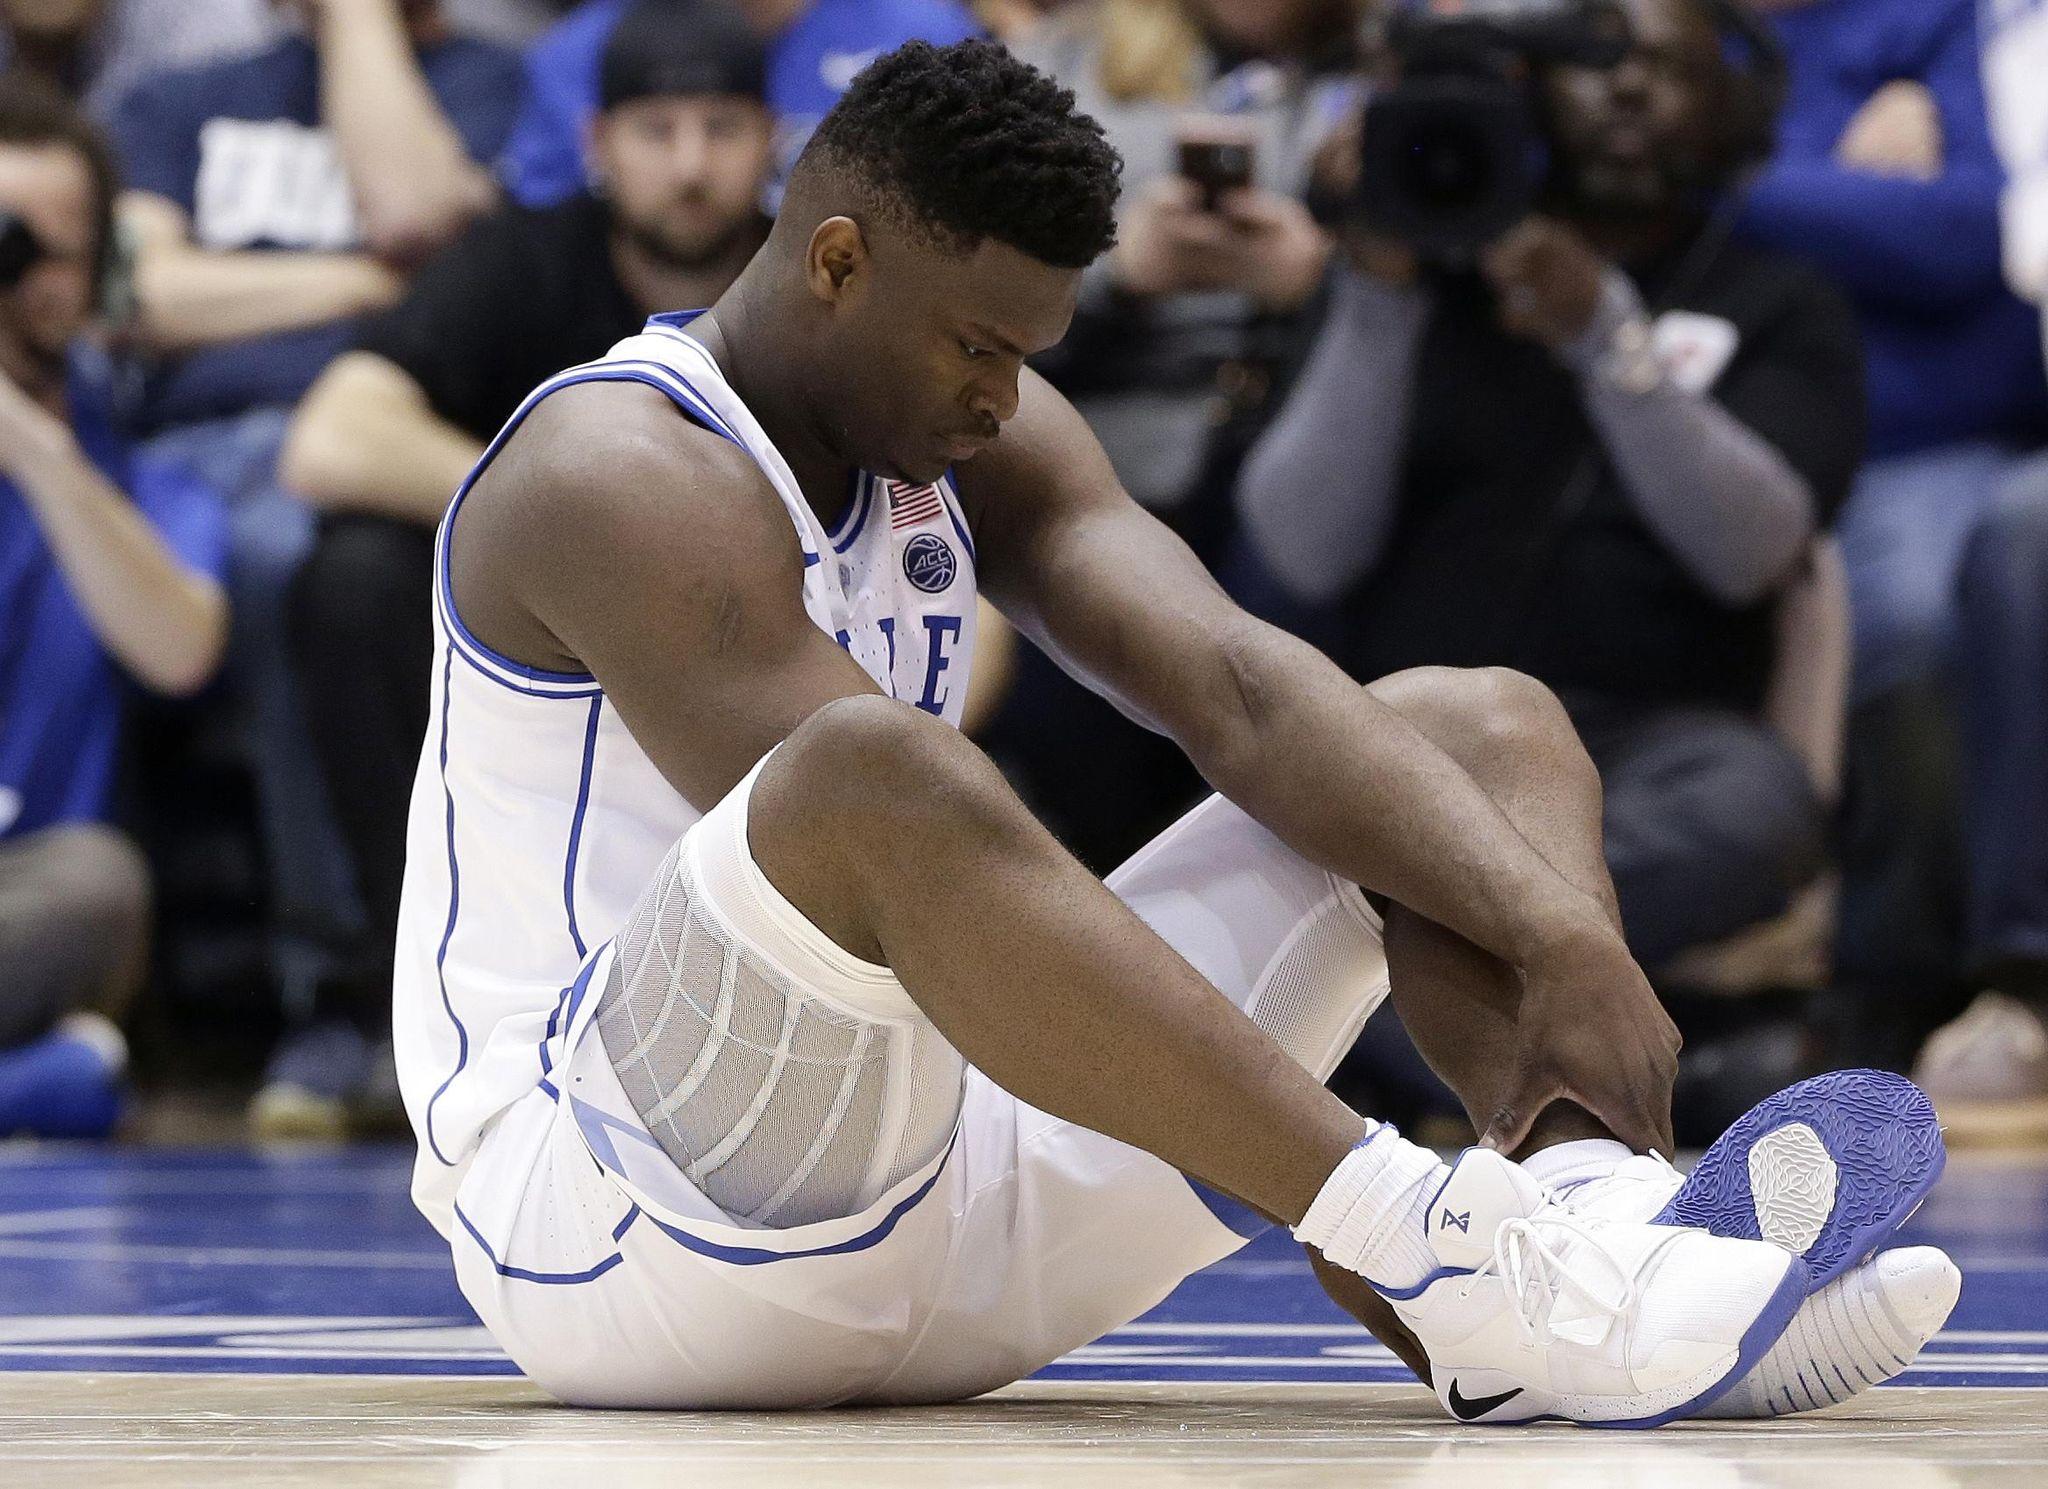 Williamson's freak injury ripples in basketball, business worlds